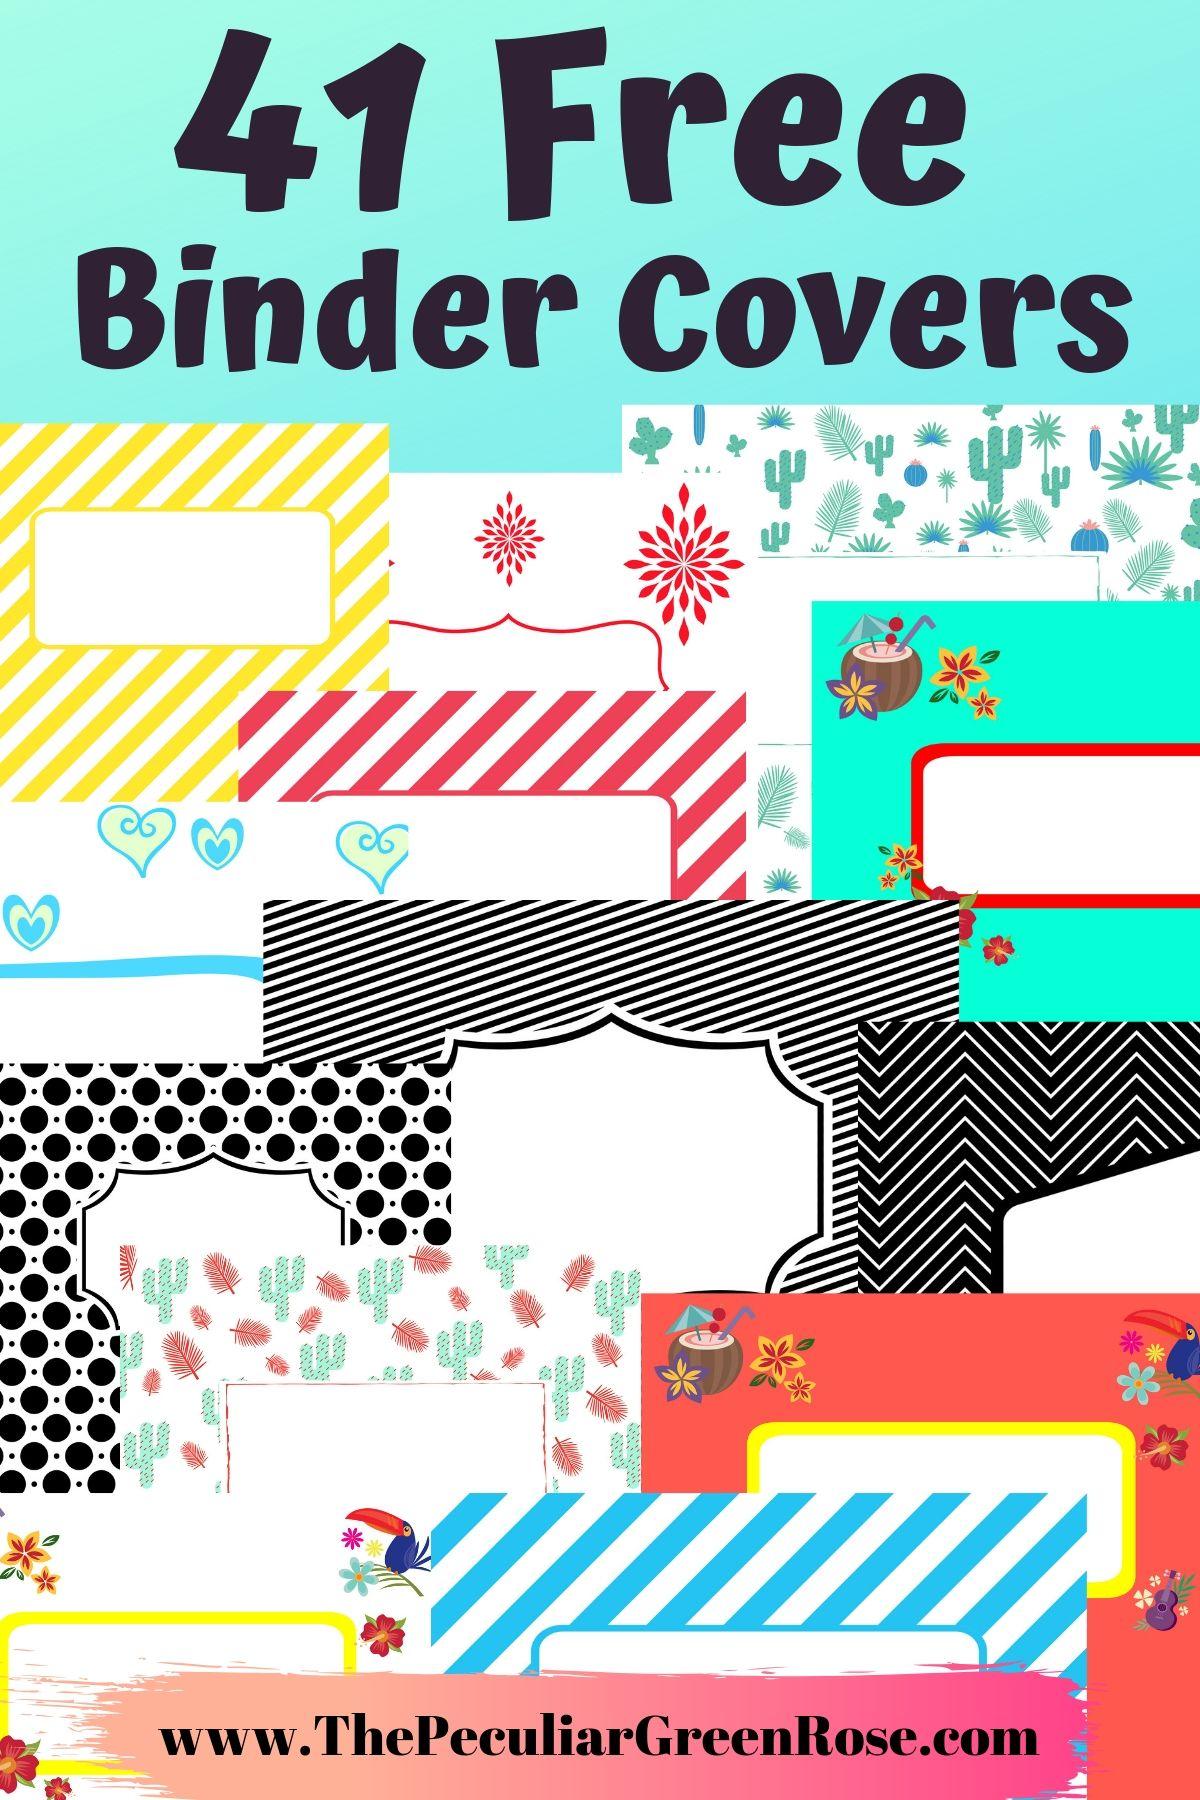 graphic regarding Printable Binder Covers Free identified as 41 Free of charge Printable Binder Handles - The Unusual Eco-friendly Rose